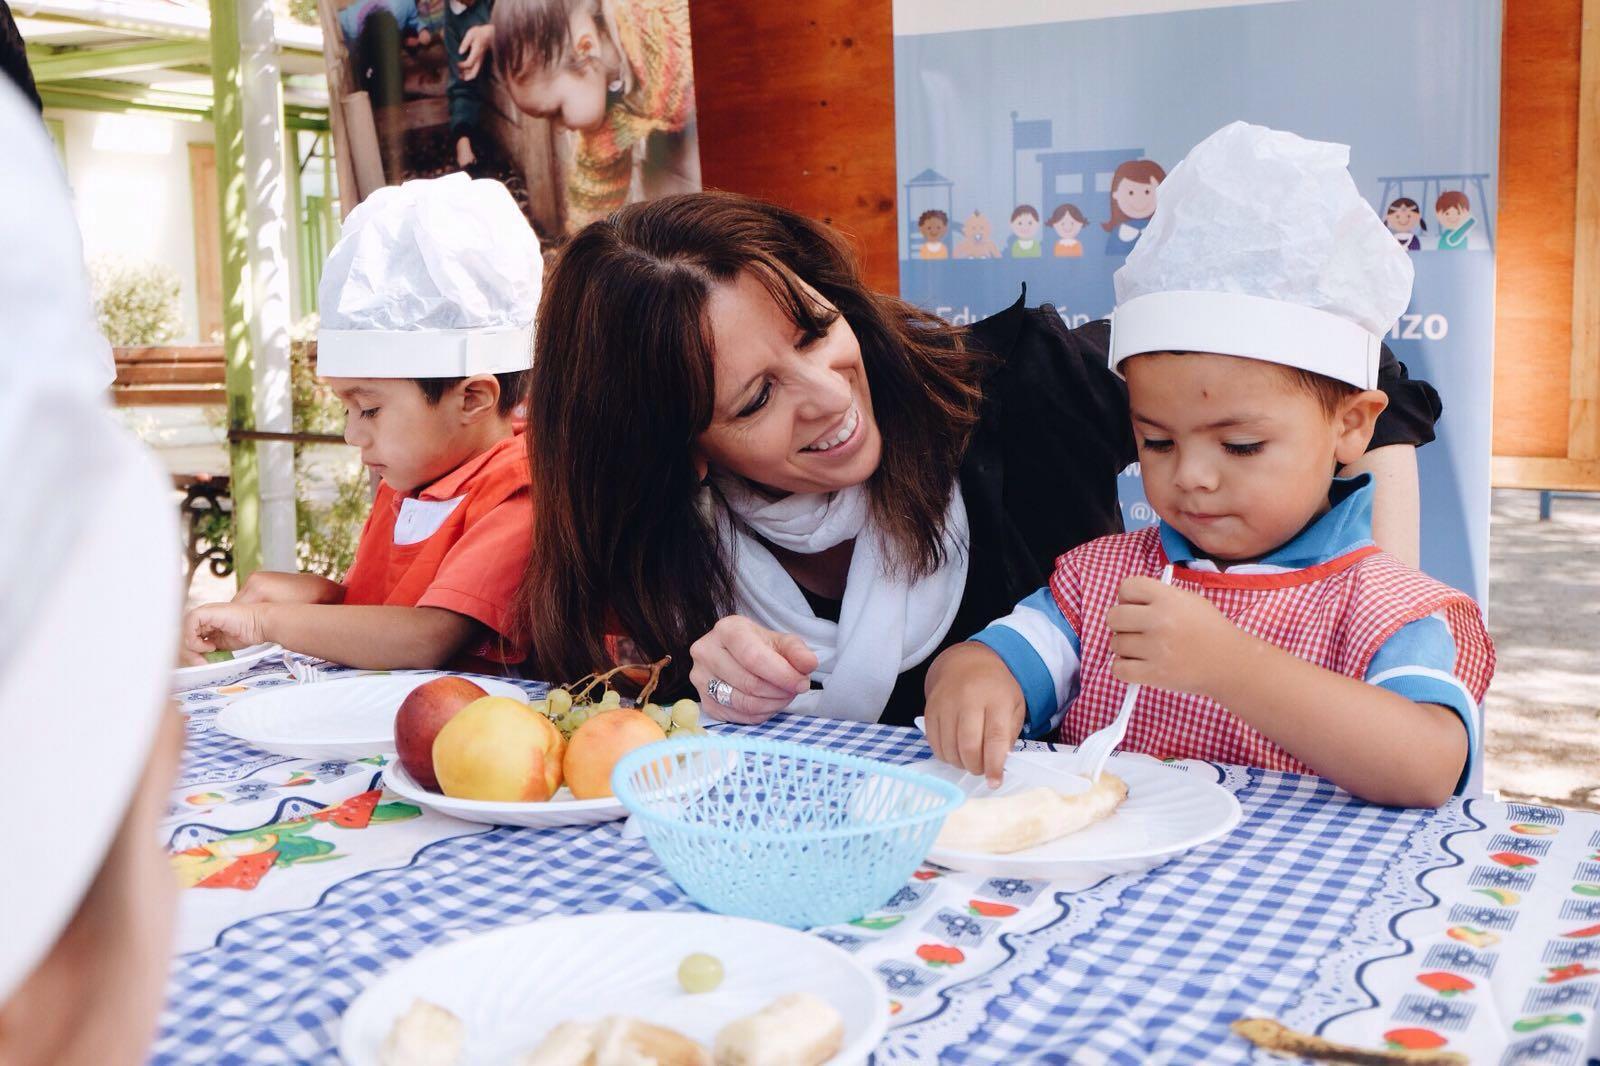 Ministra s de educaci n sobre programa jard n de verano for Jardin infantil verano 2016